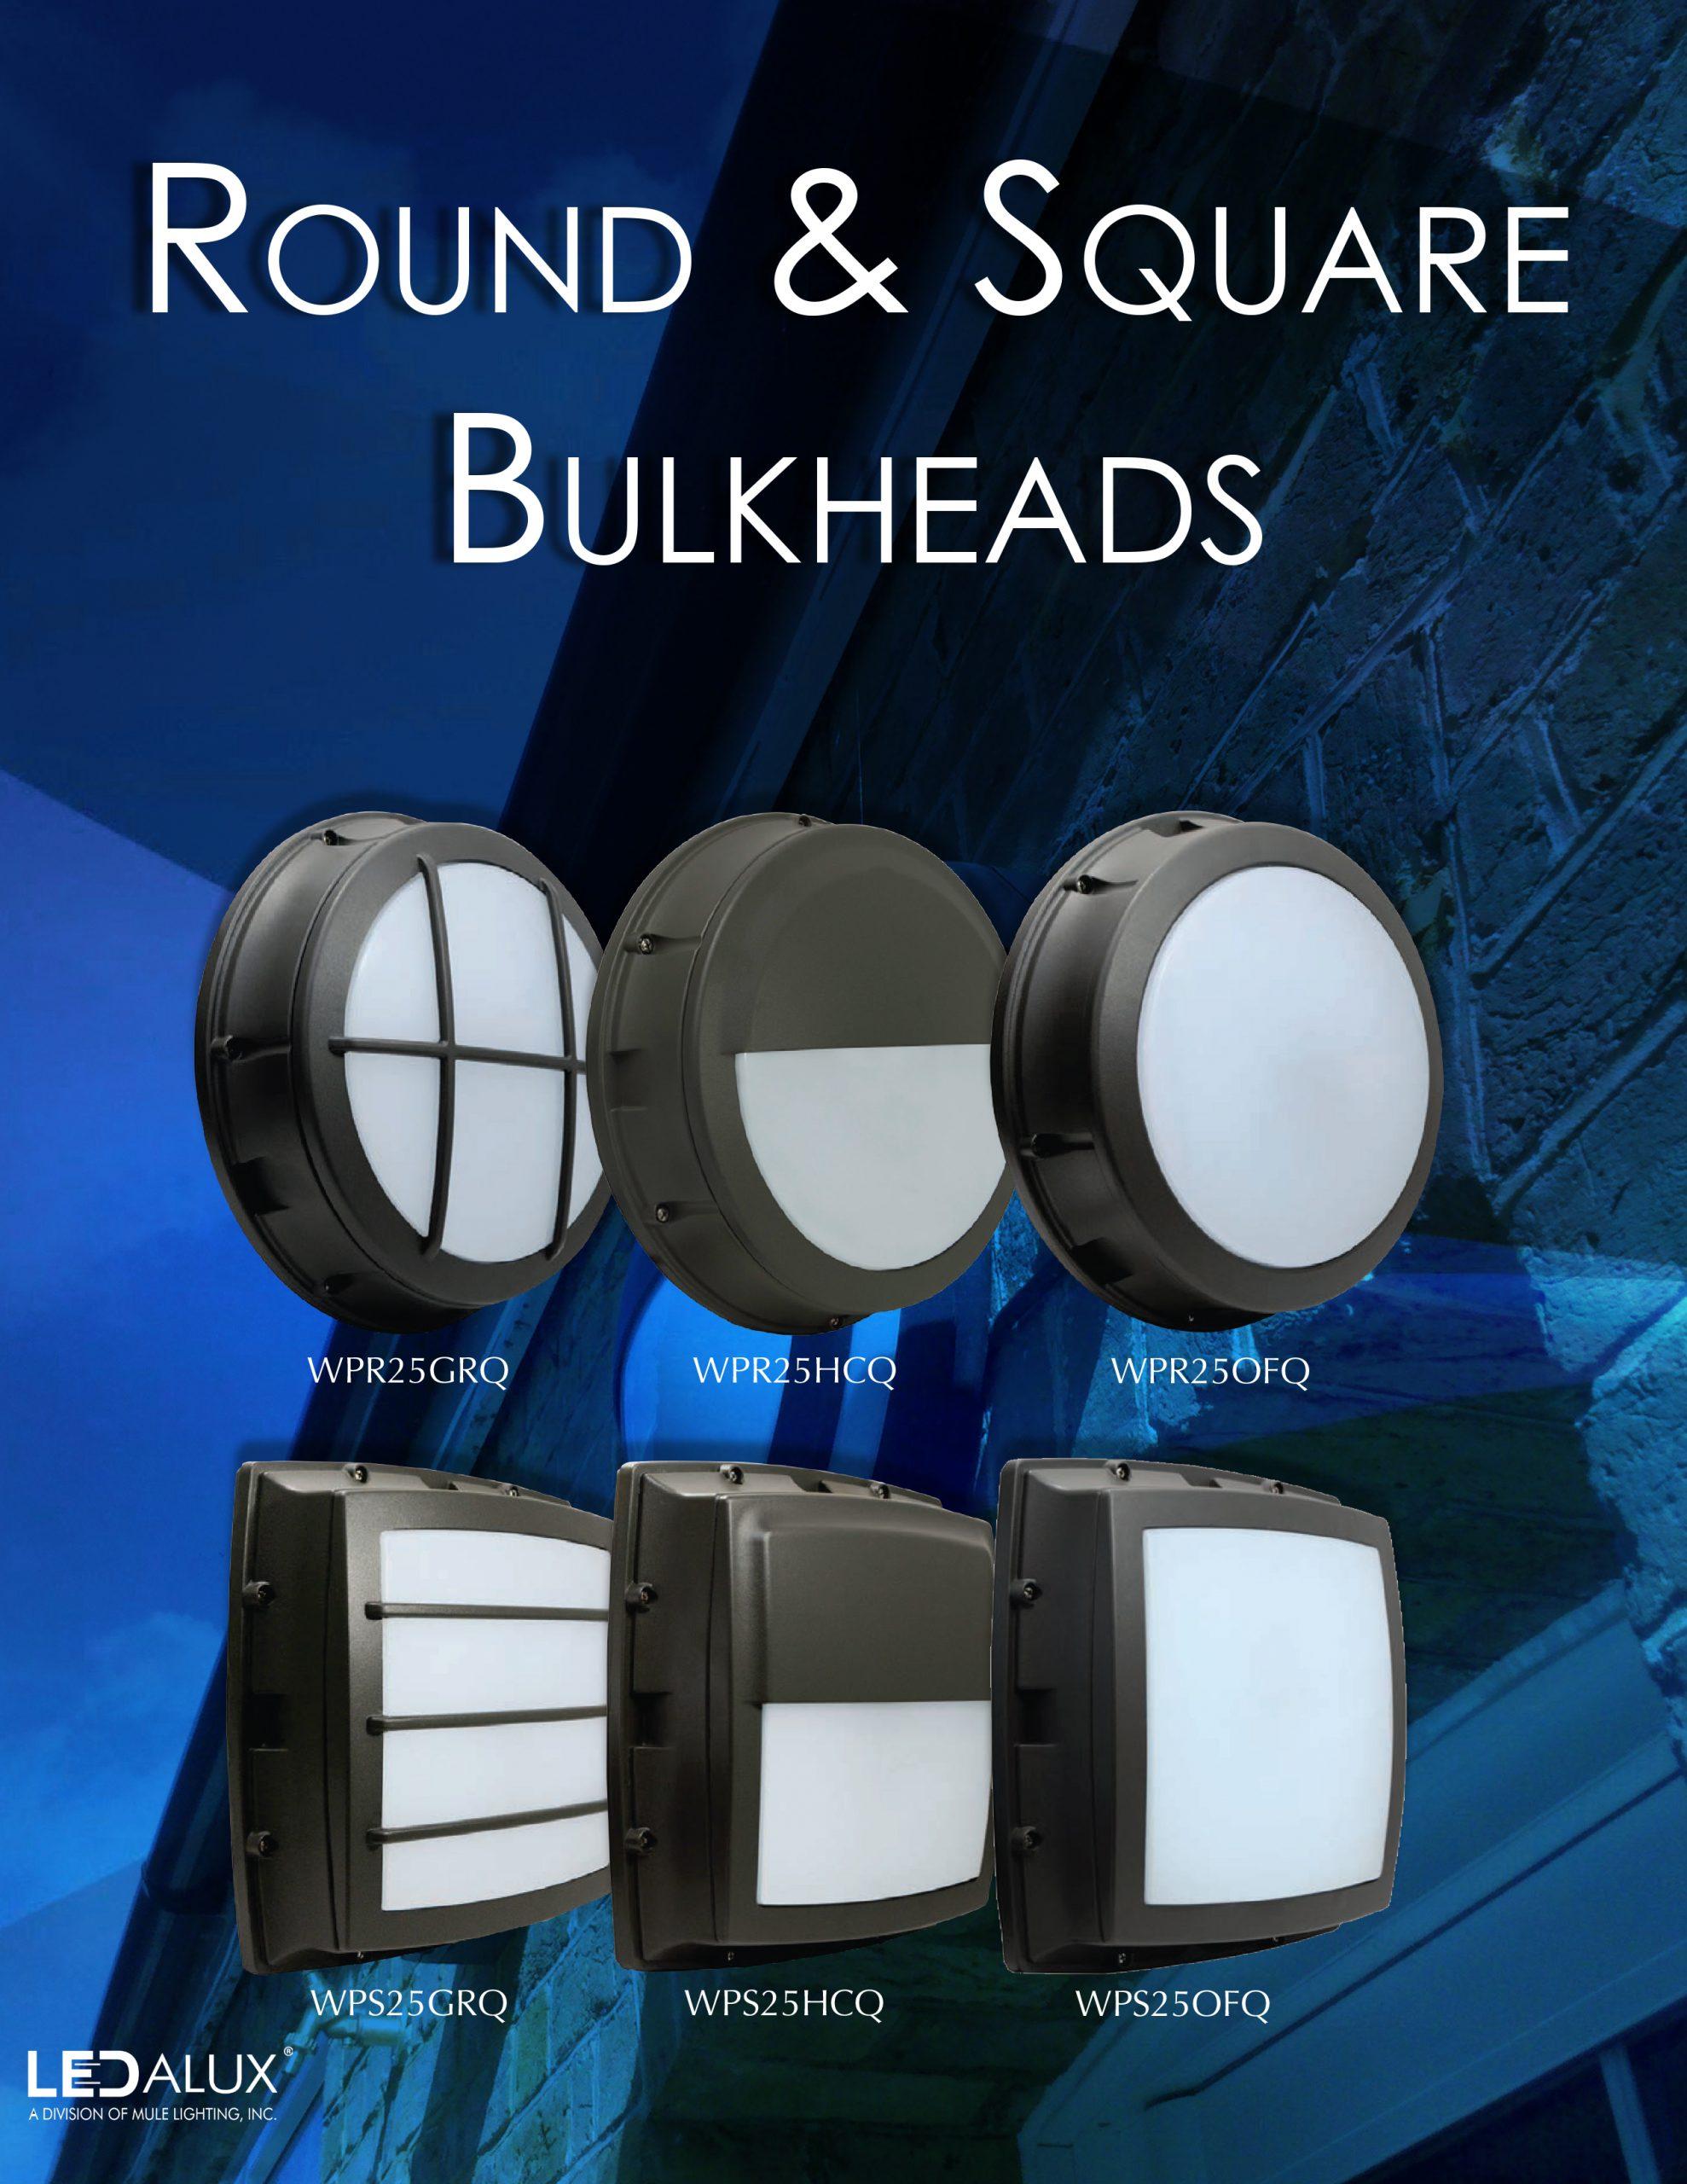 LEDalux Round & Square Bulkheads Literature